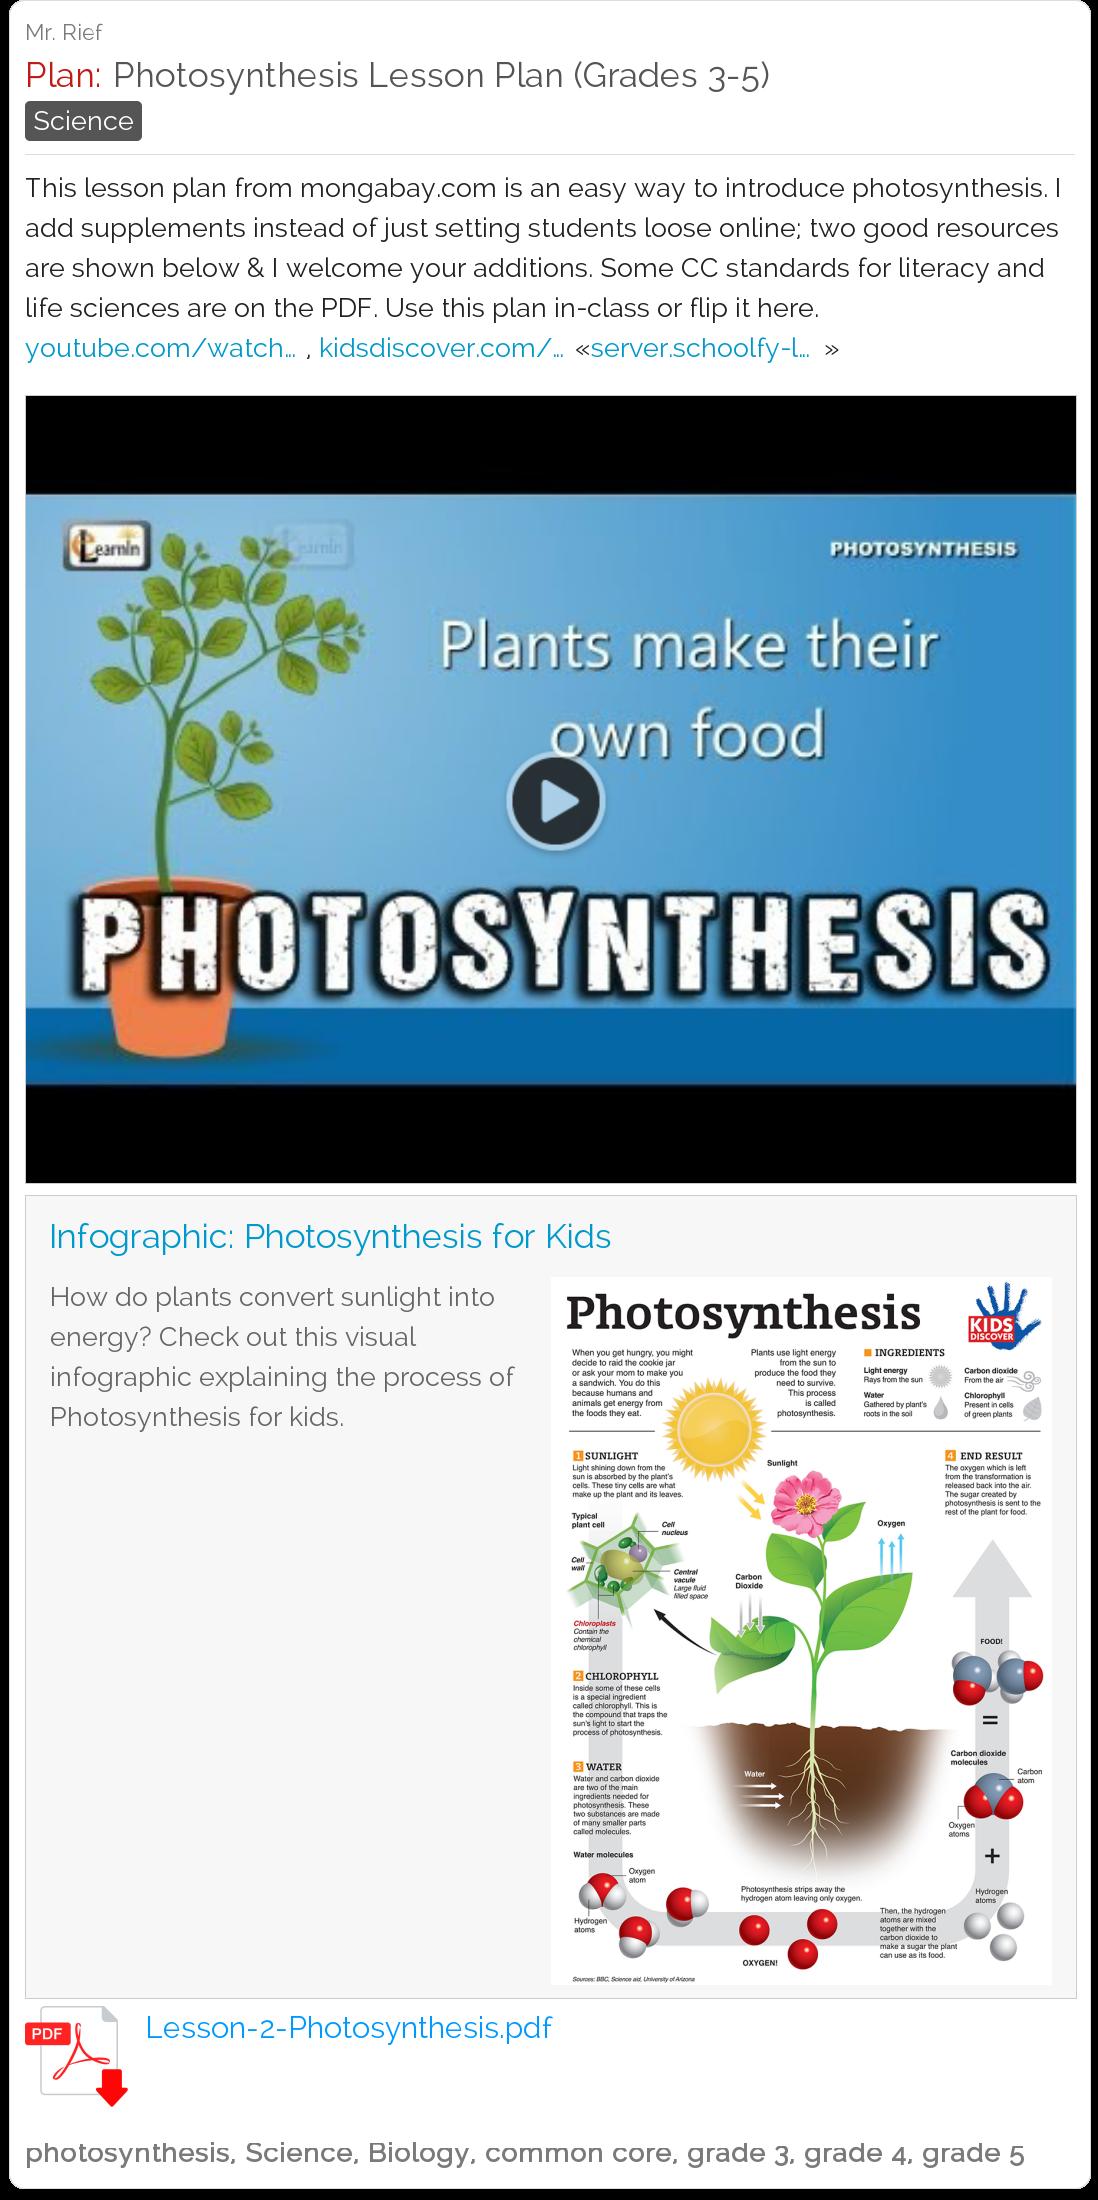 Free Photosynthesis Lesson Plan (Grades 3, 4, 5) Video